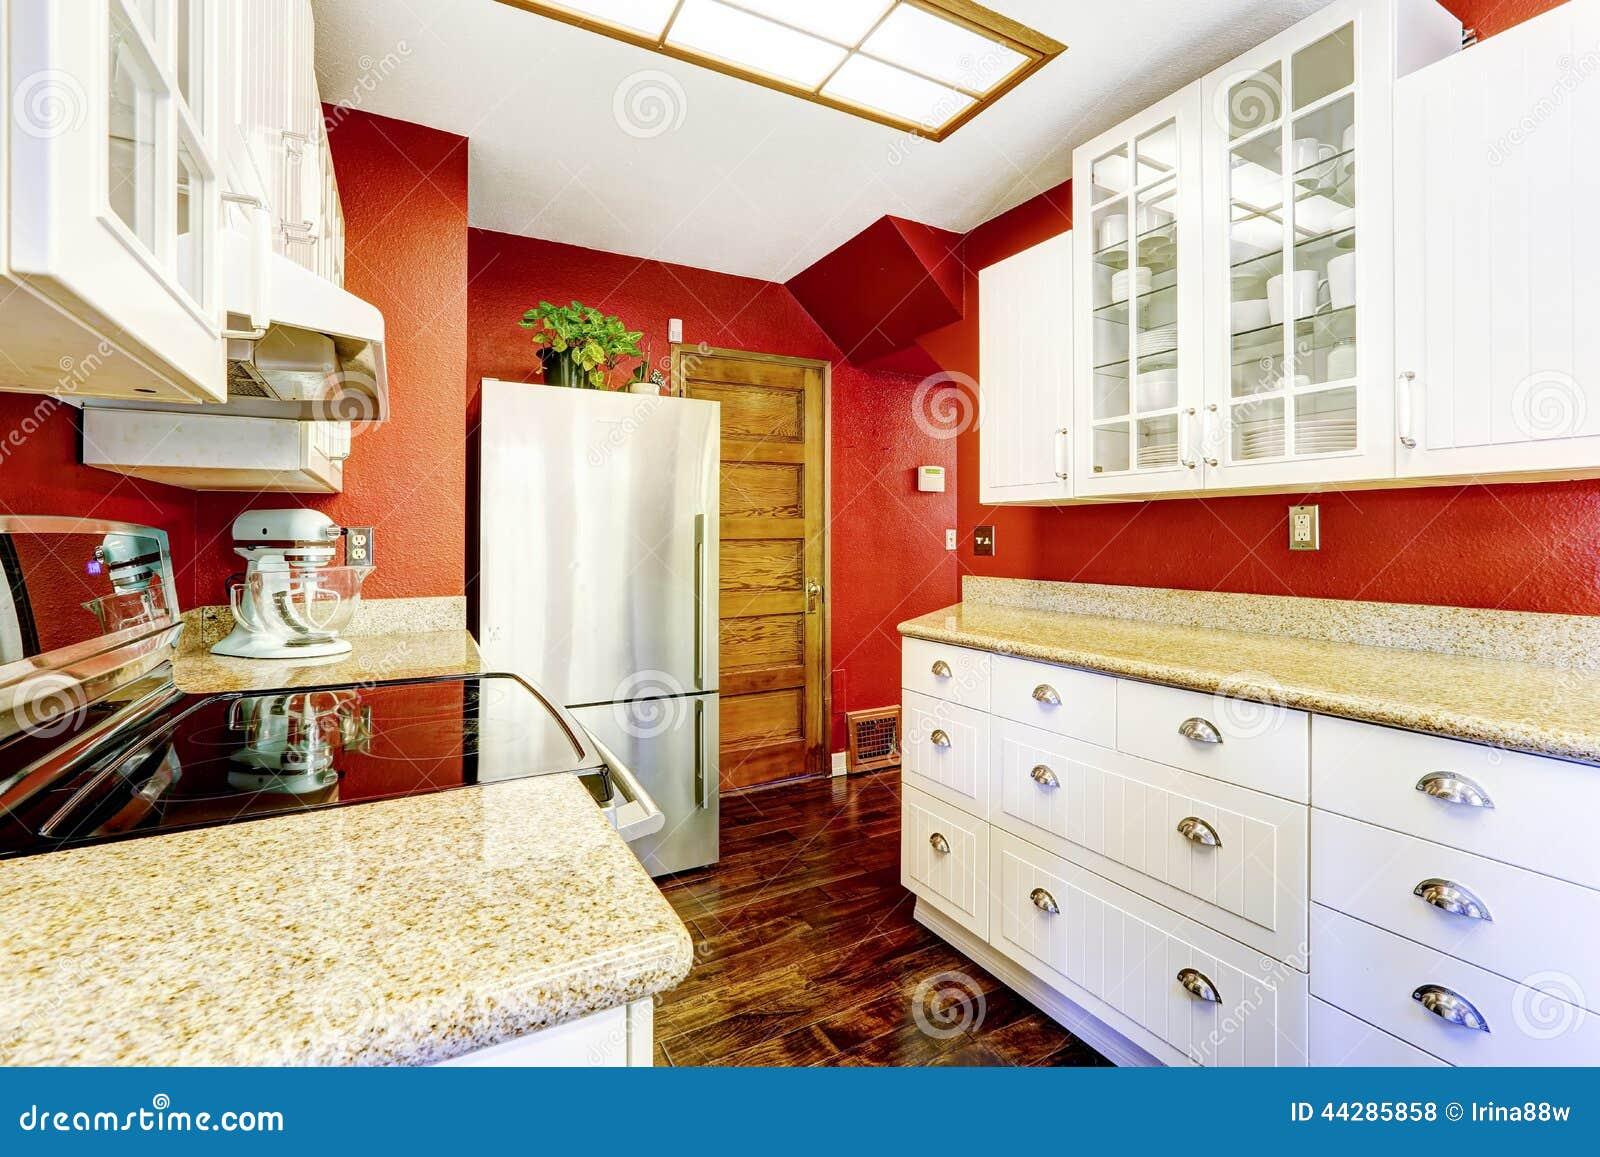 Pareti Cucina Bianca : Stanza bianca della cucina con le pareti rosse luminose di